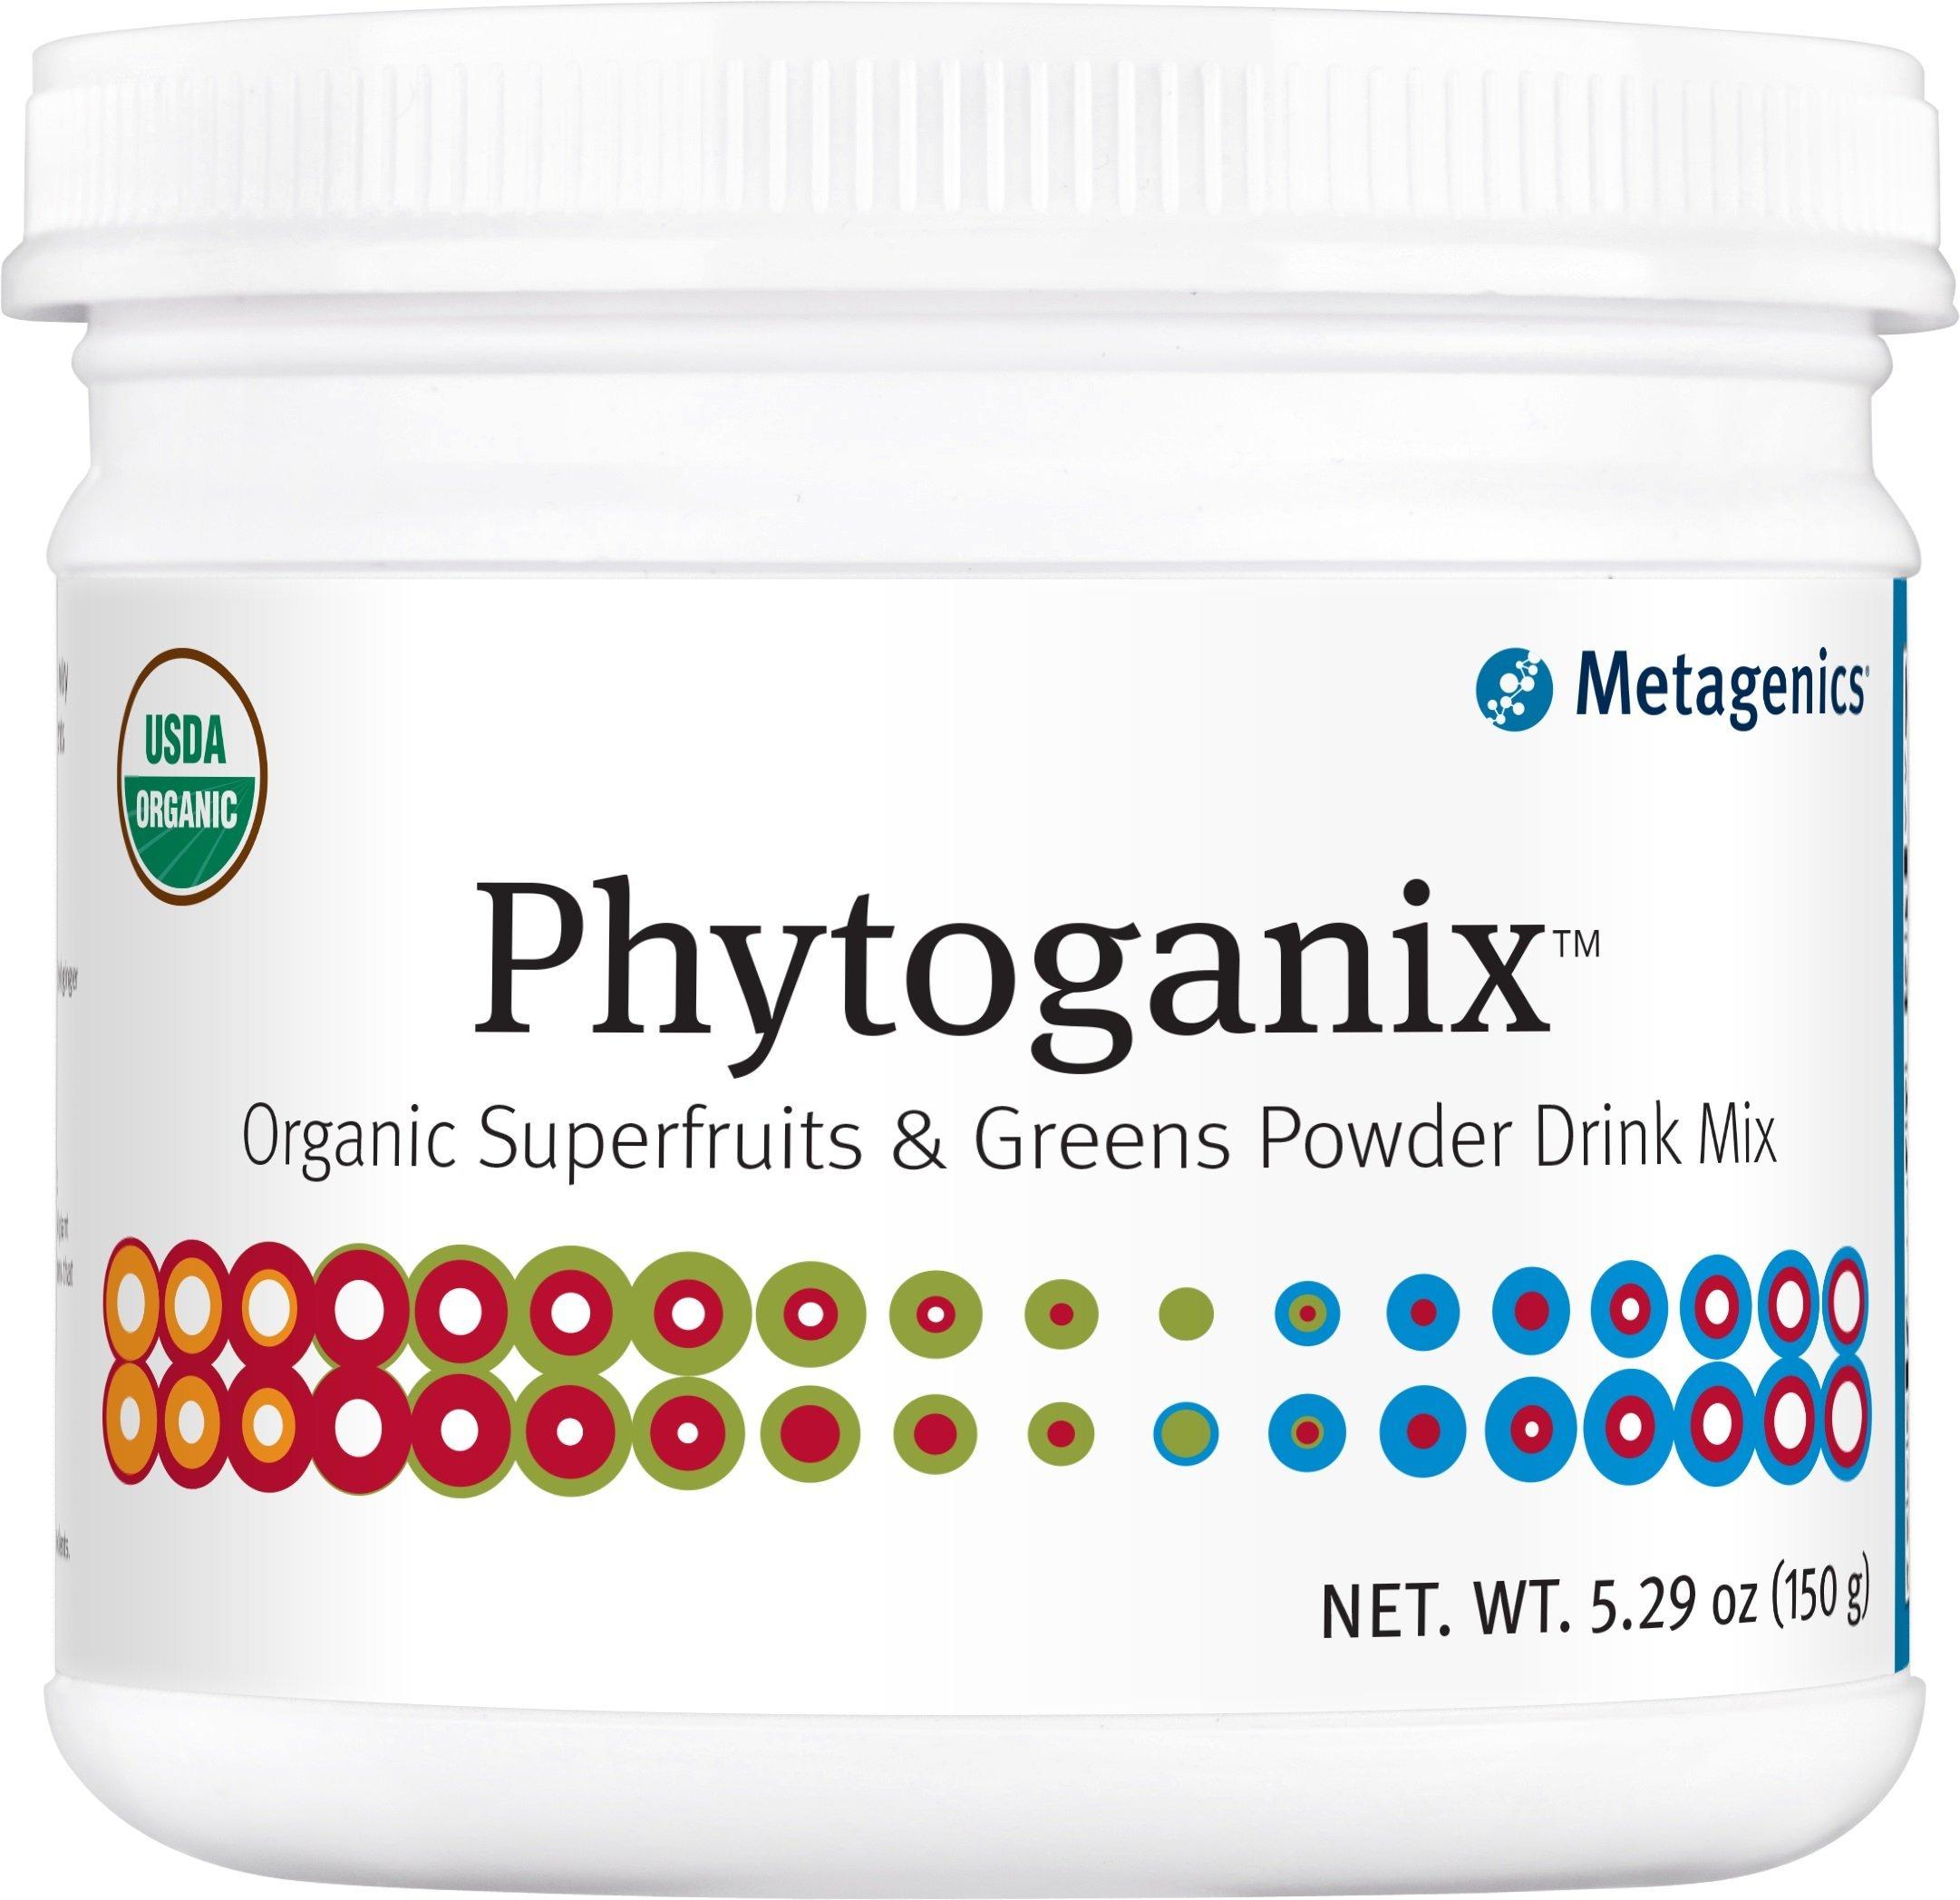 Metagenics Phytoganix Supplement, 150 Gram